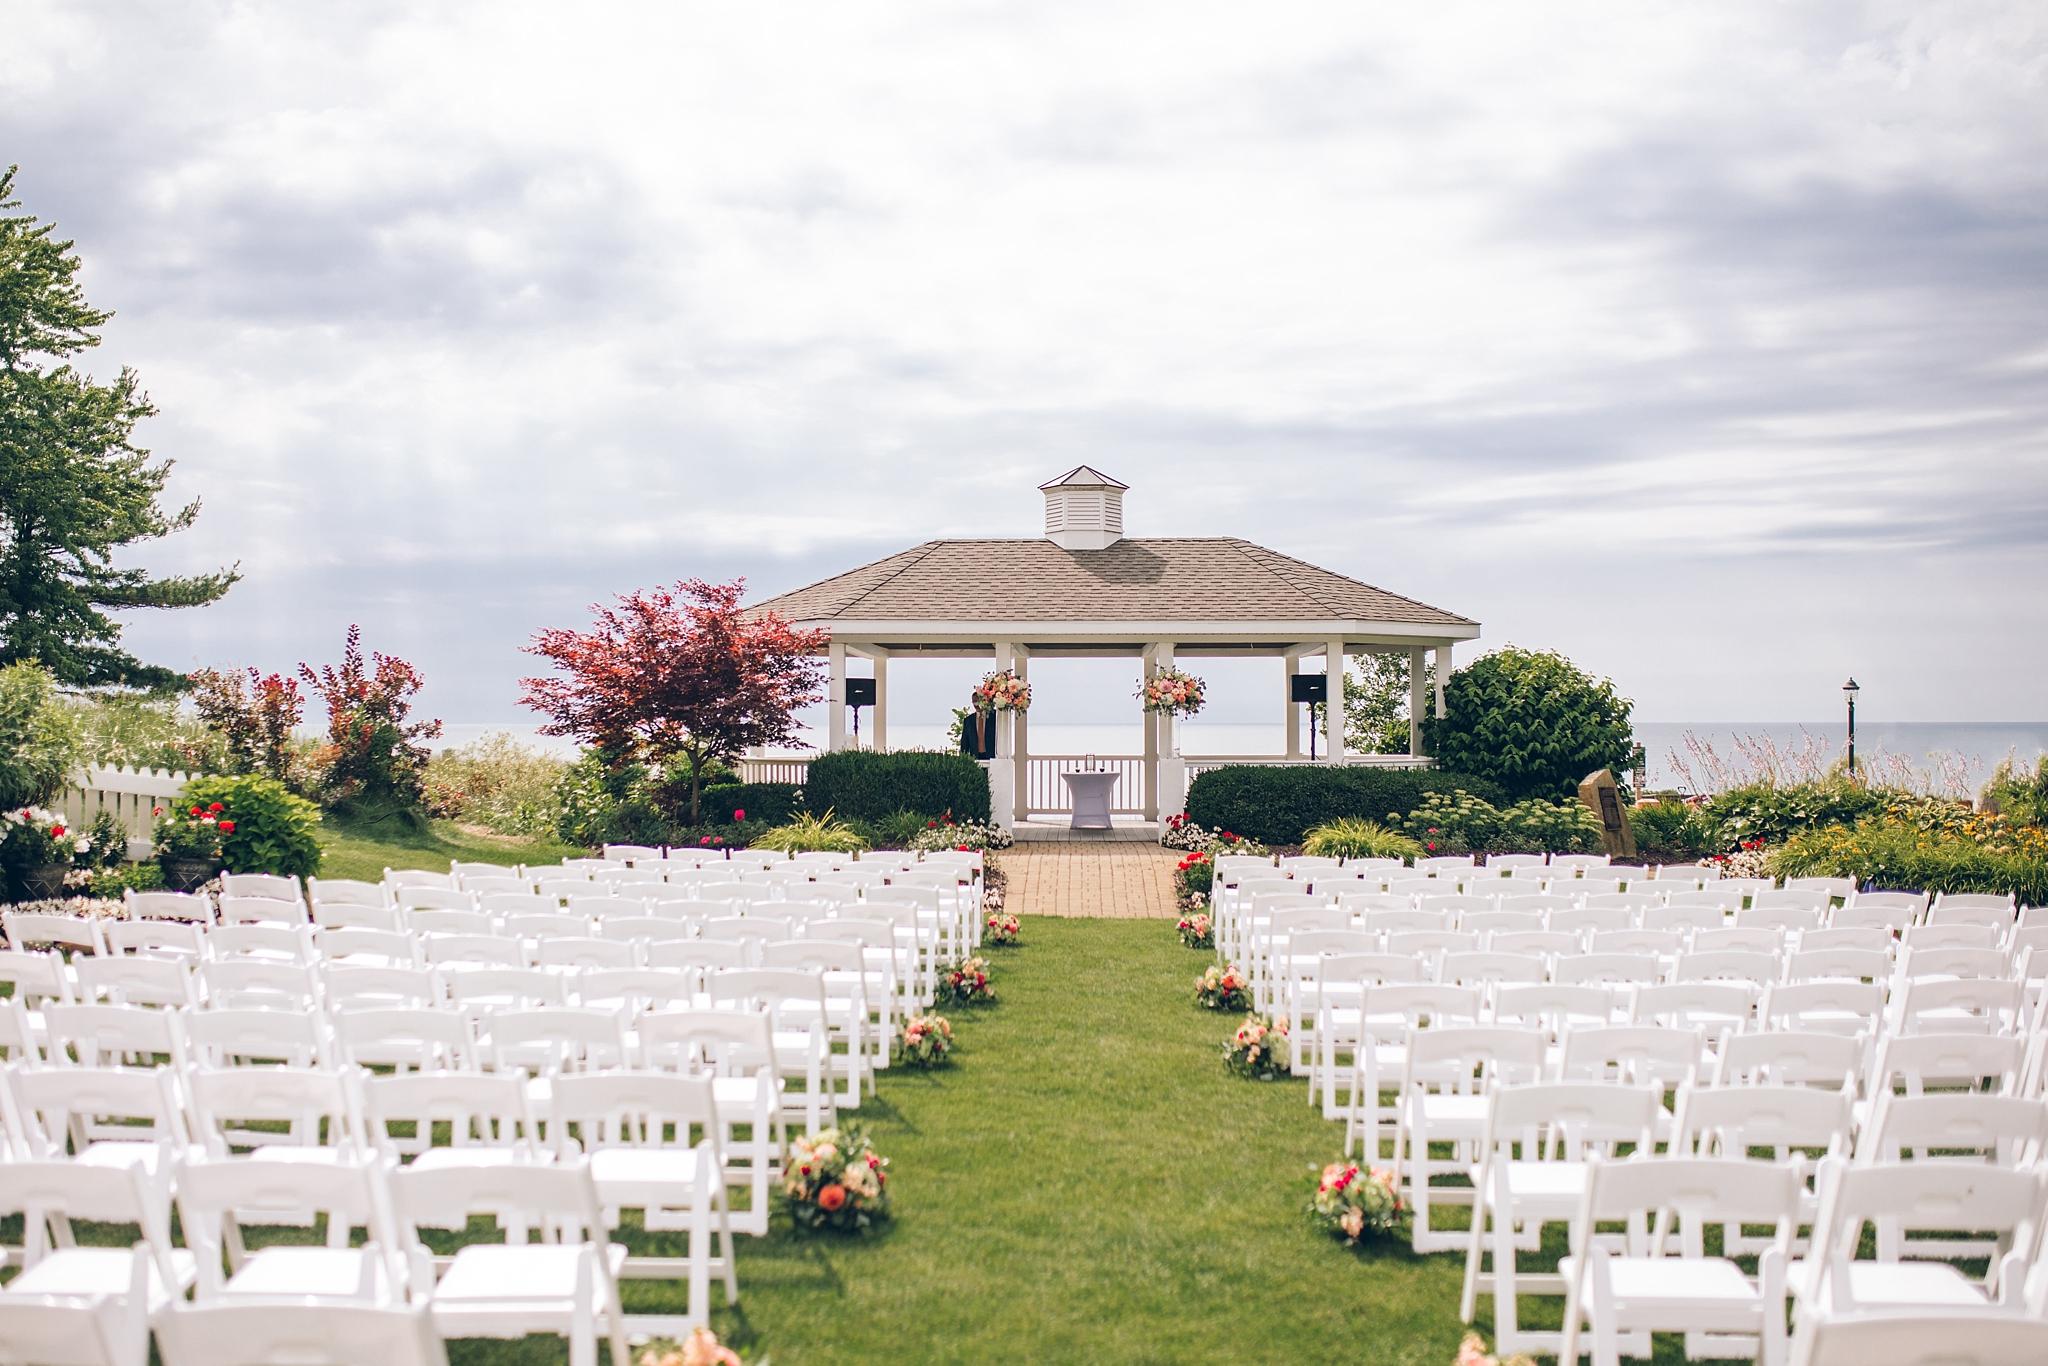 baker-lofts-holland-michigan-wedding-photographer_0347.jpg